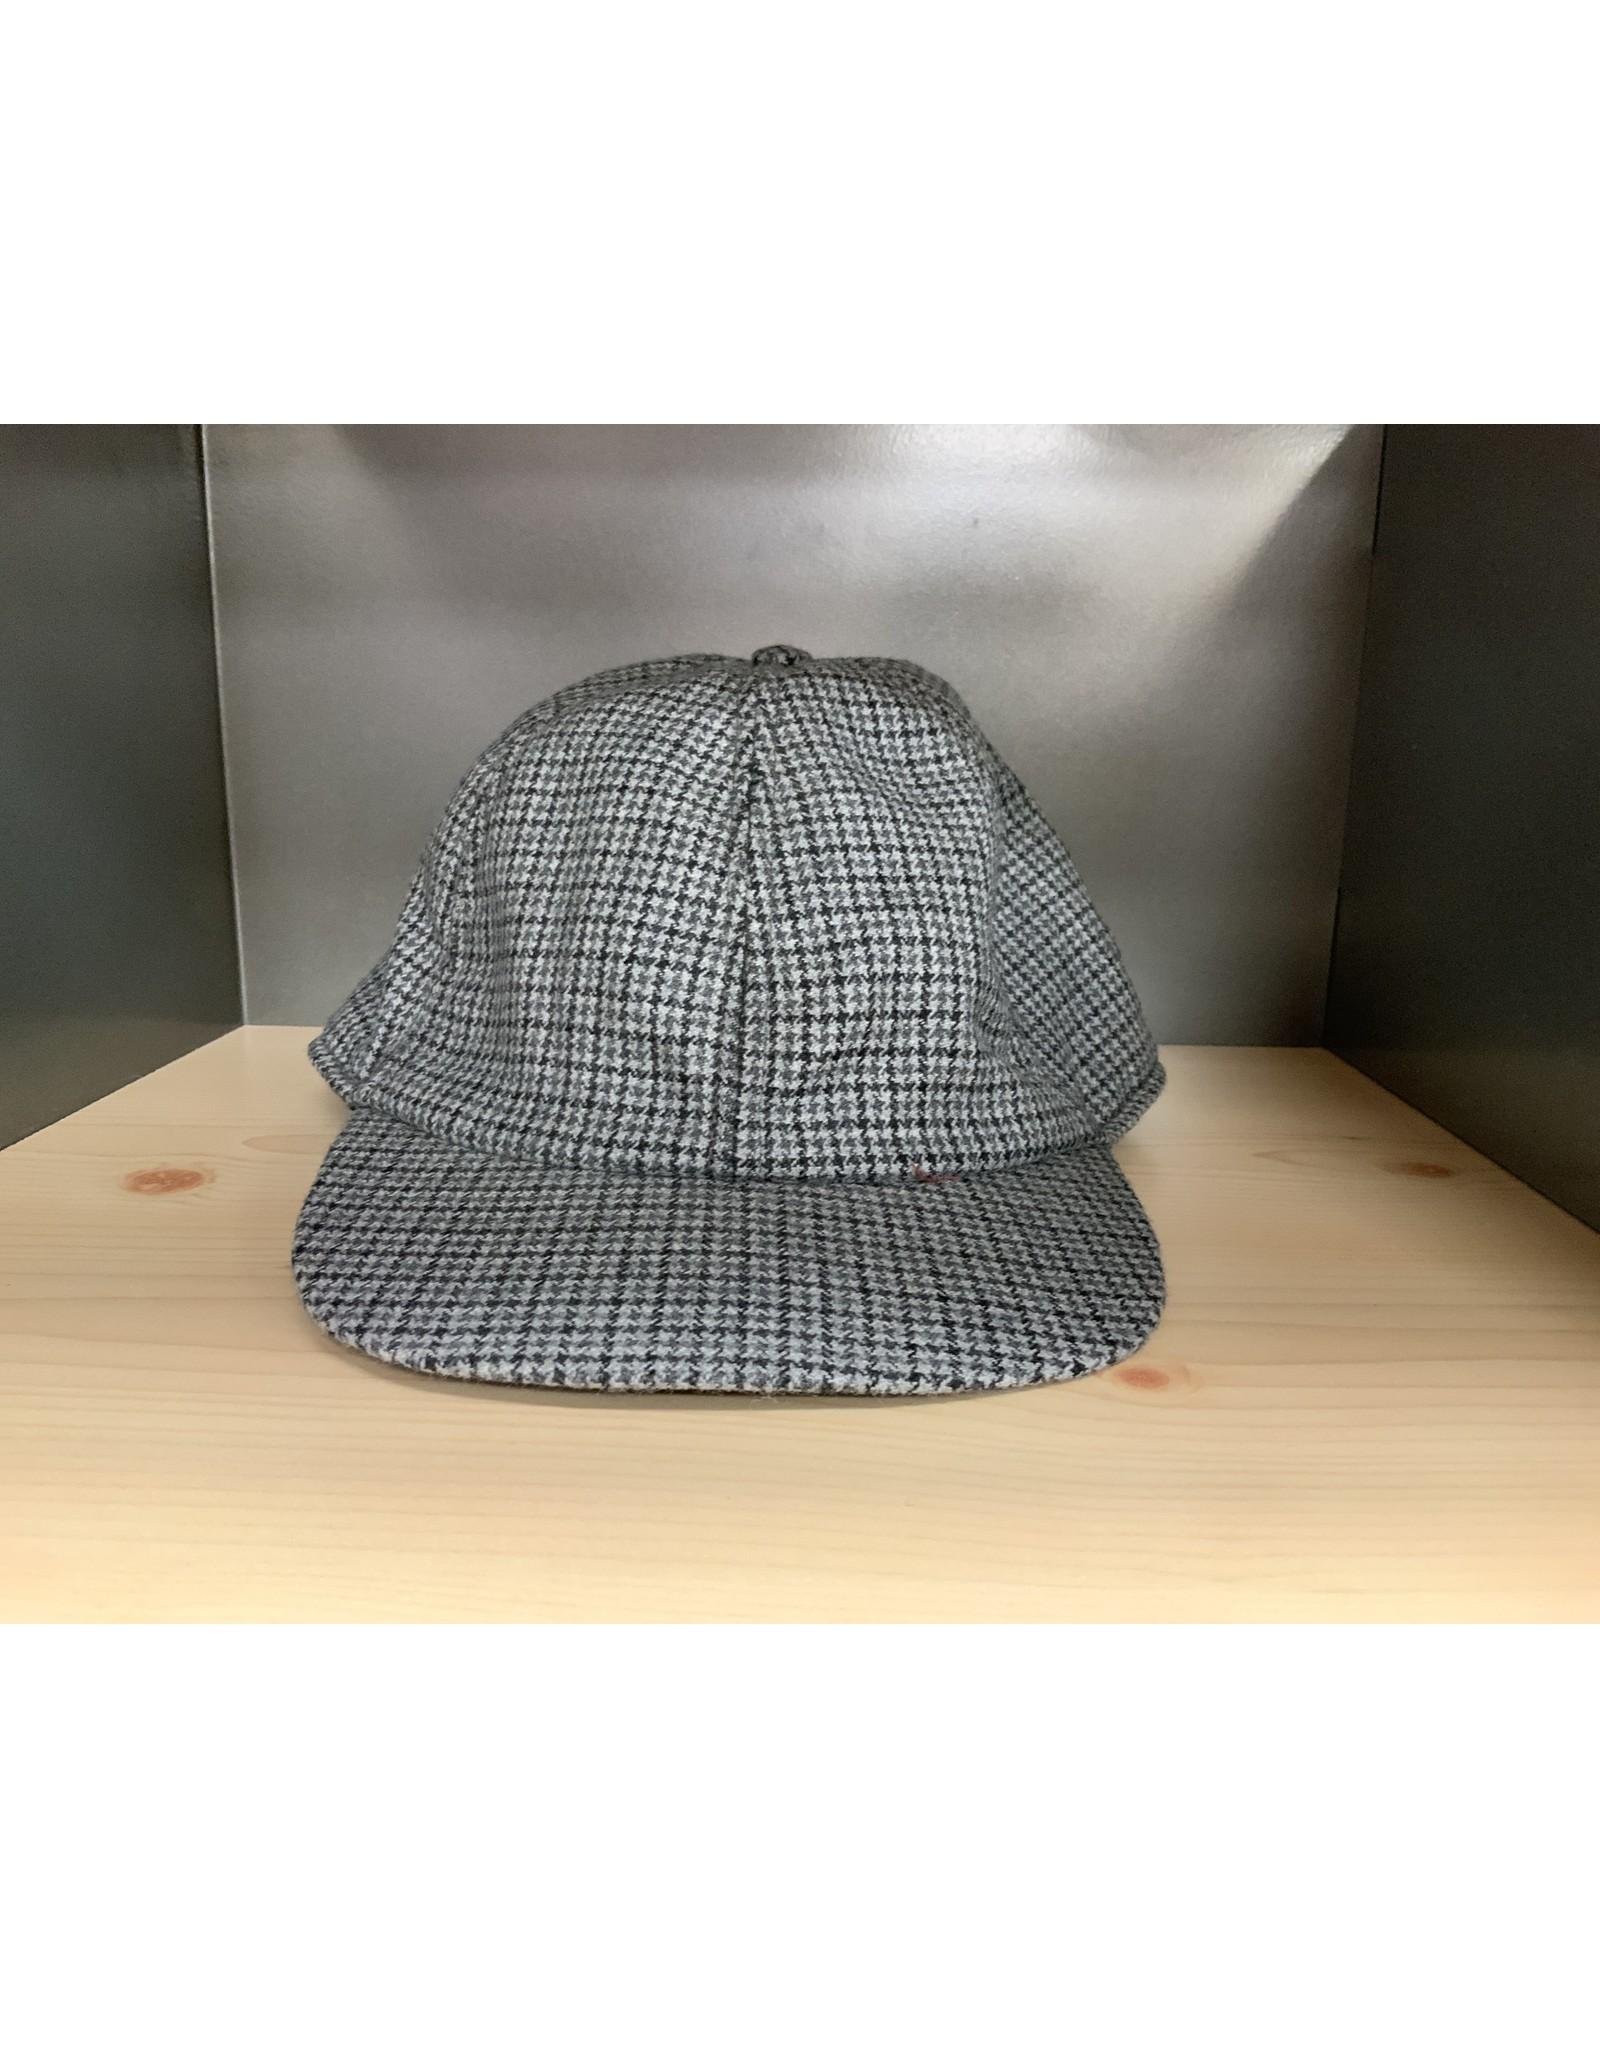 CROWN CAP 6 PANEL